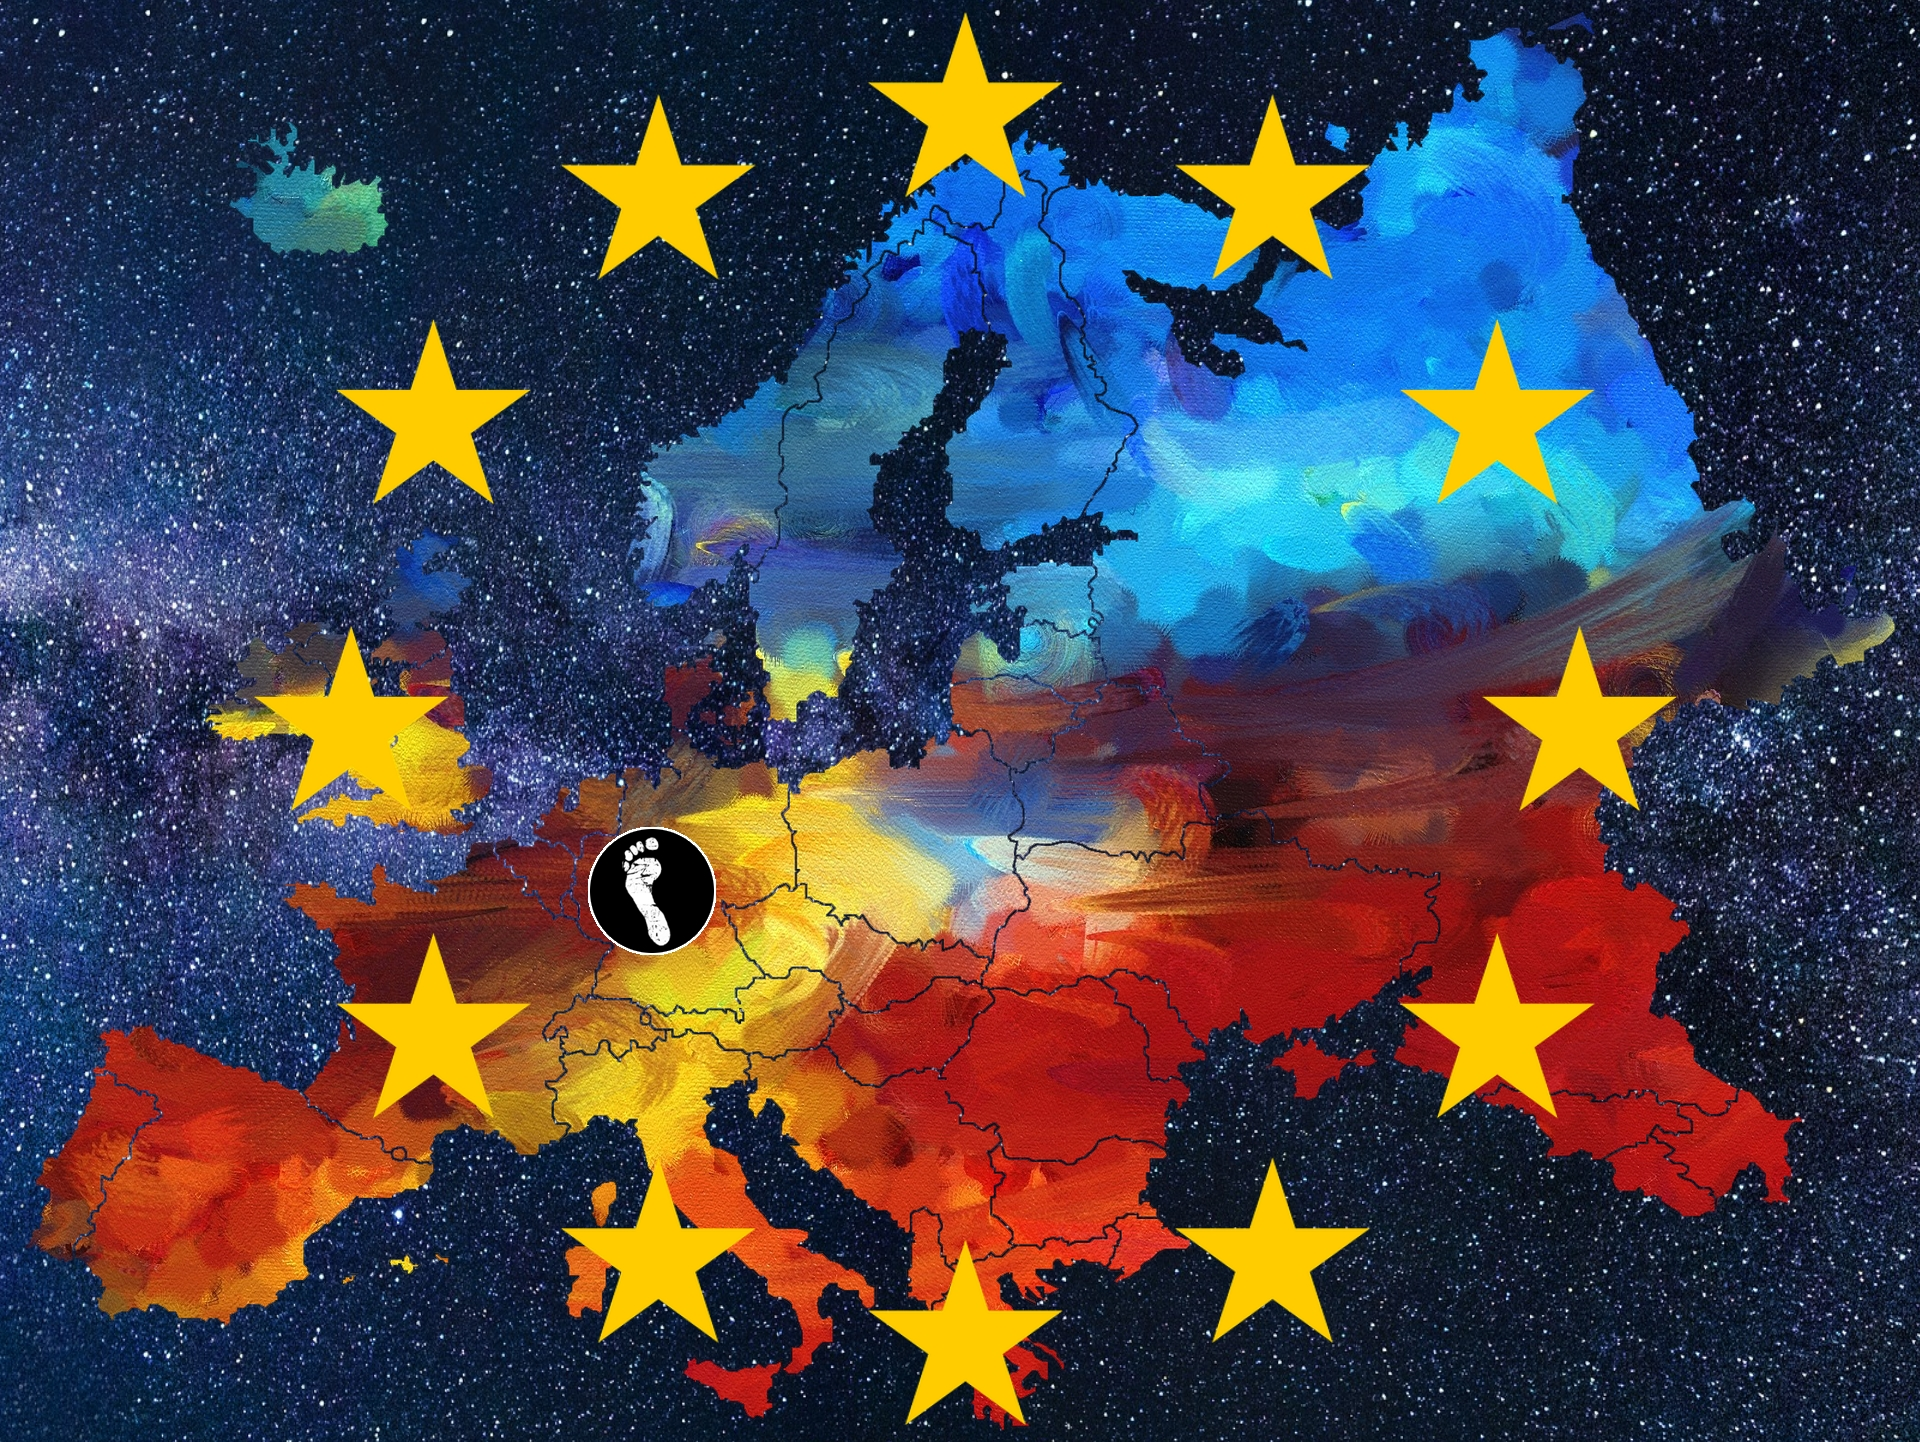 Dare to dream - Eurovision Song Contest 2019